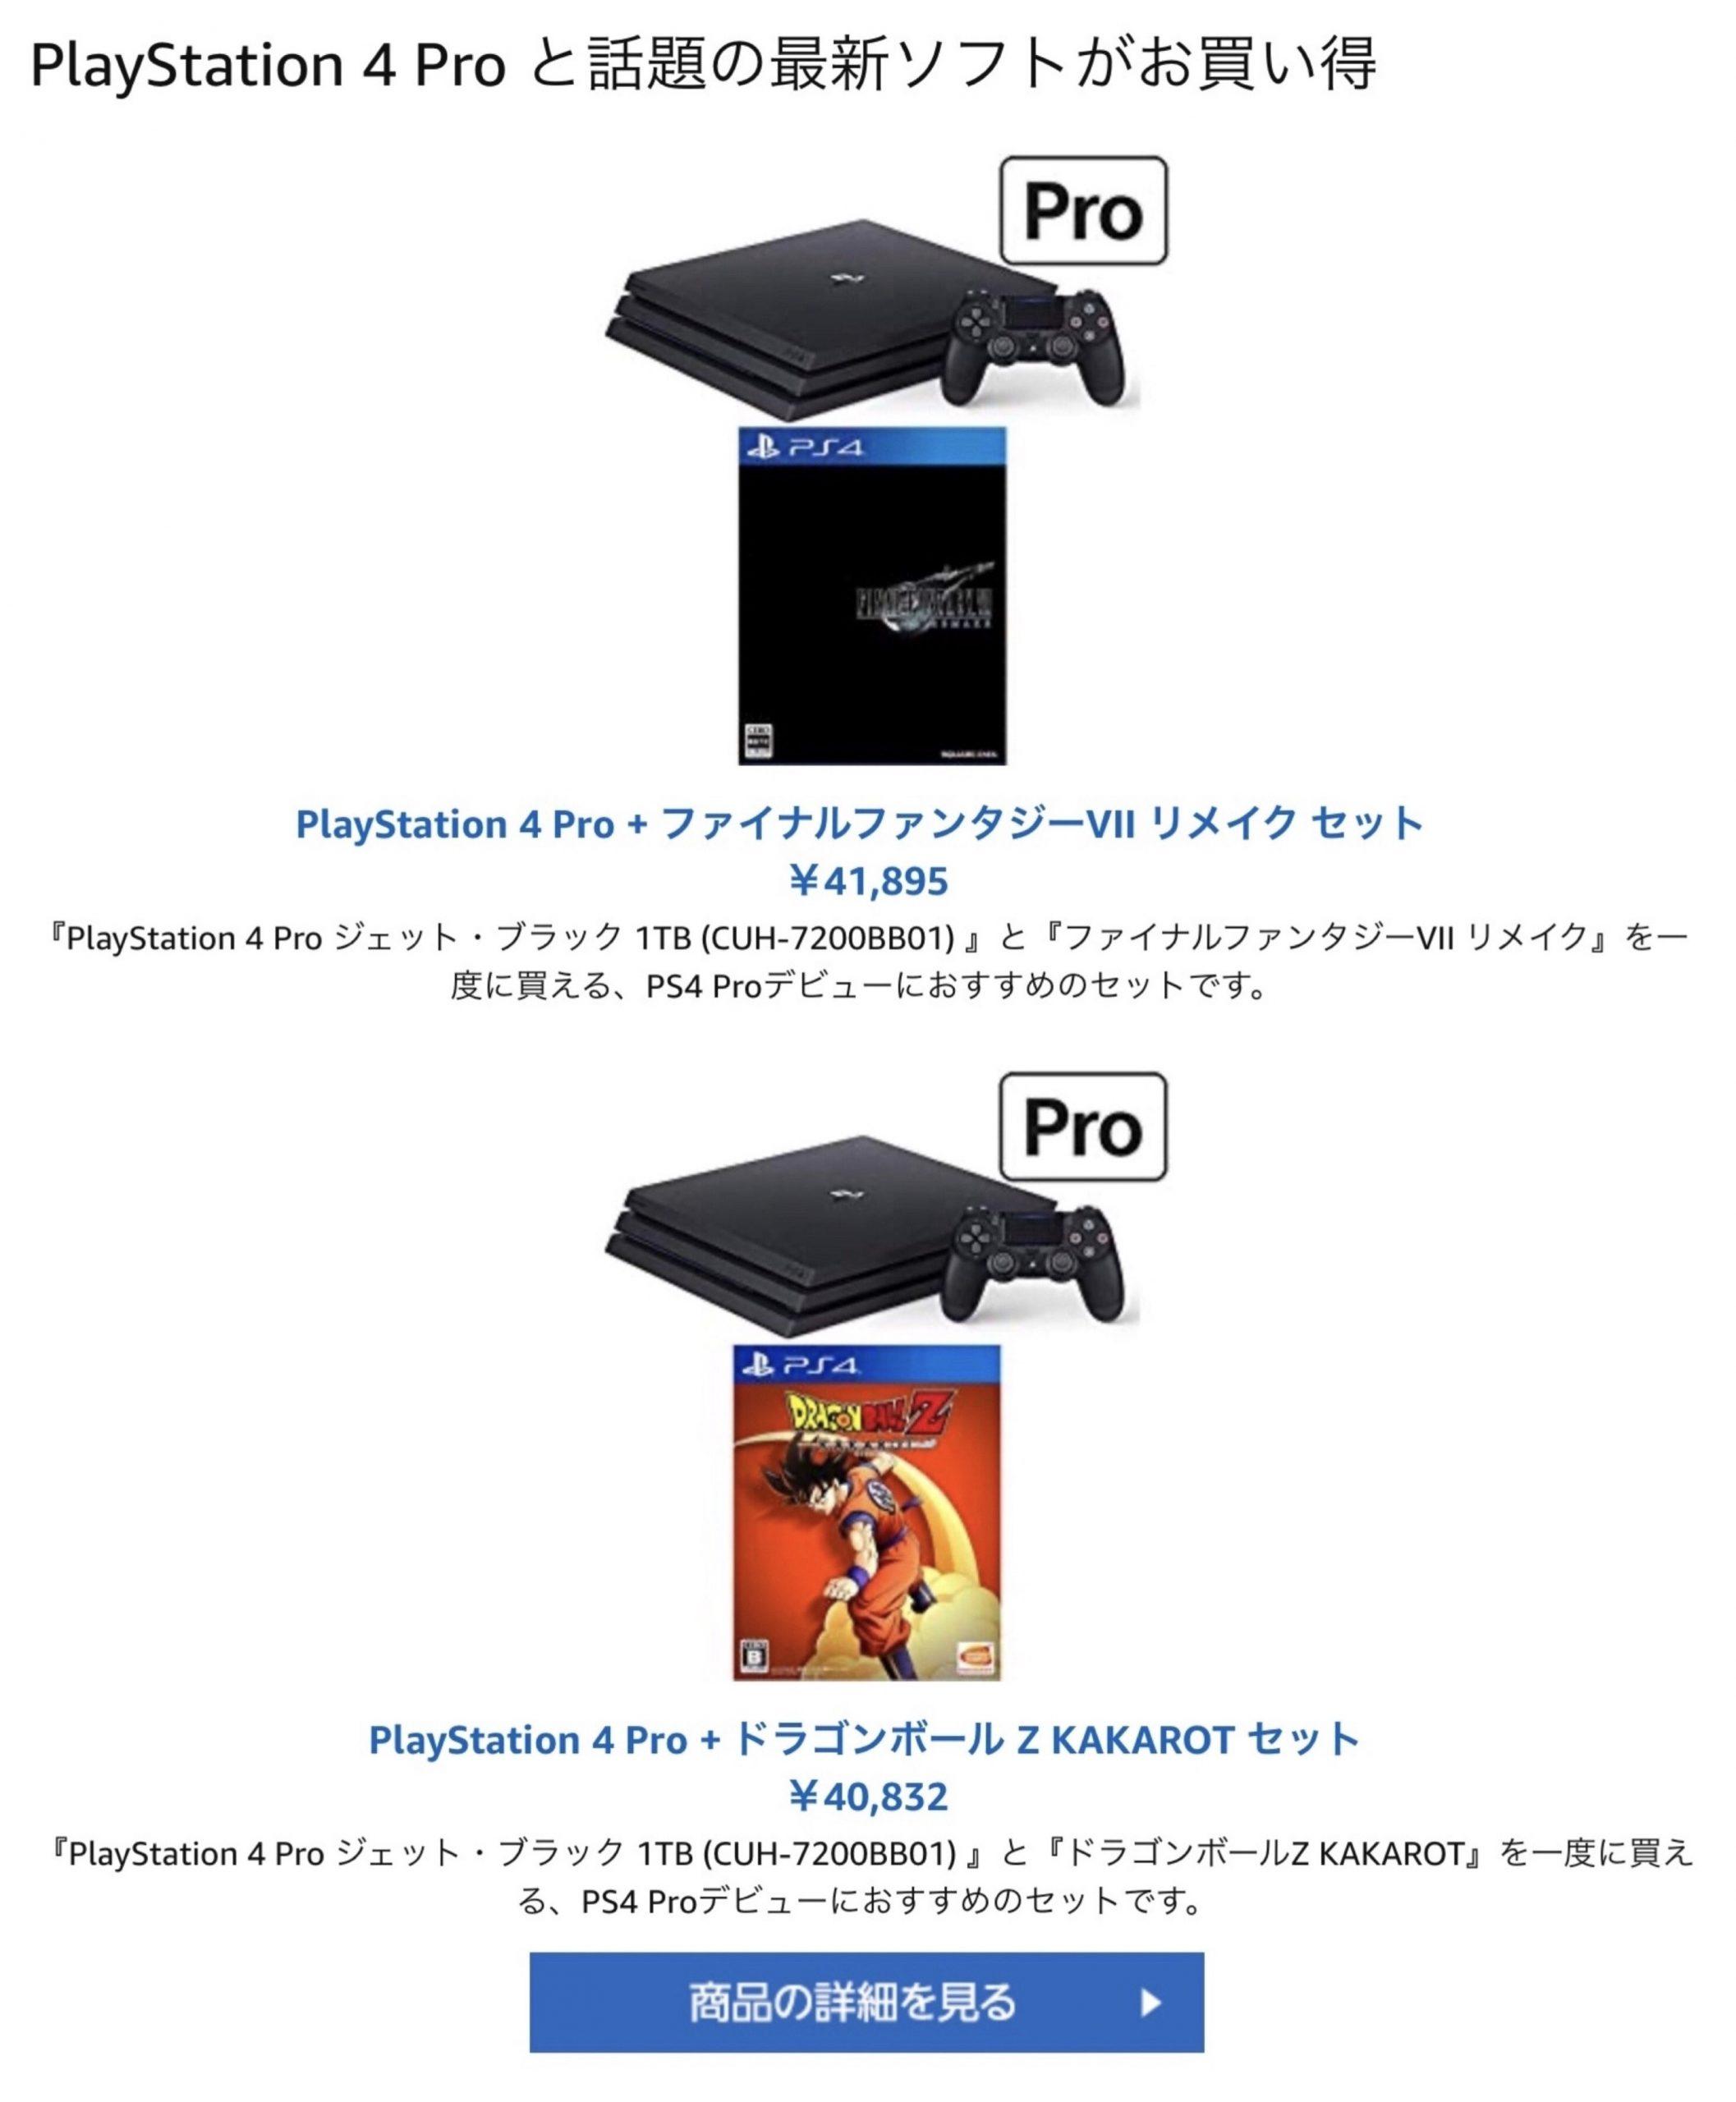 dHAyfKE scaled - 【速報】AmazonサイバーマンデーセールのPS4がマジで激安!本体1万円引き+ソフト2本無料